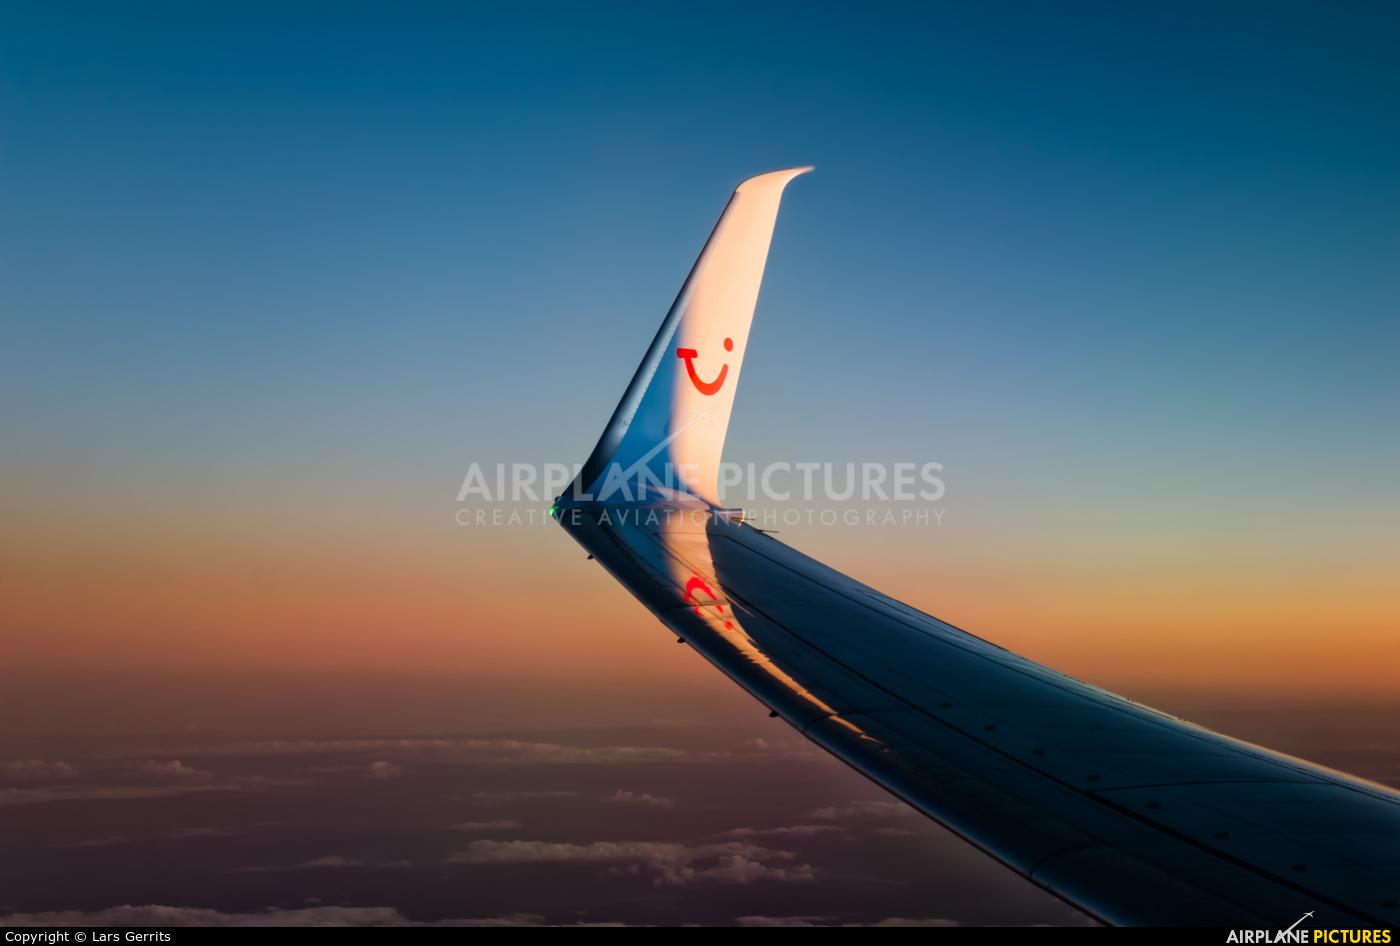 TUI Airlines Netherlands PH-TFA aircraft at In Flight - International